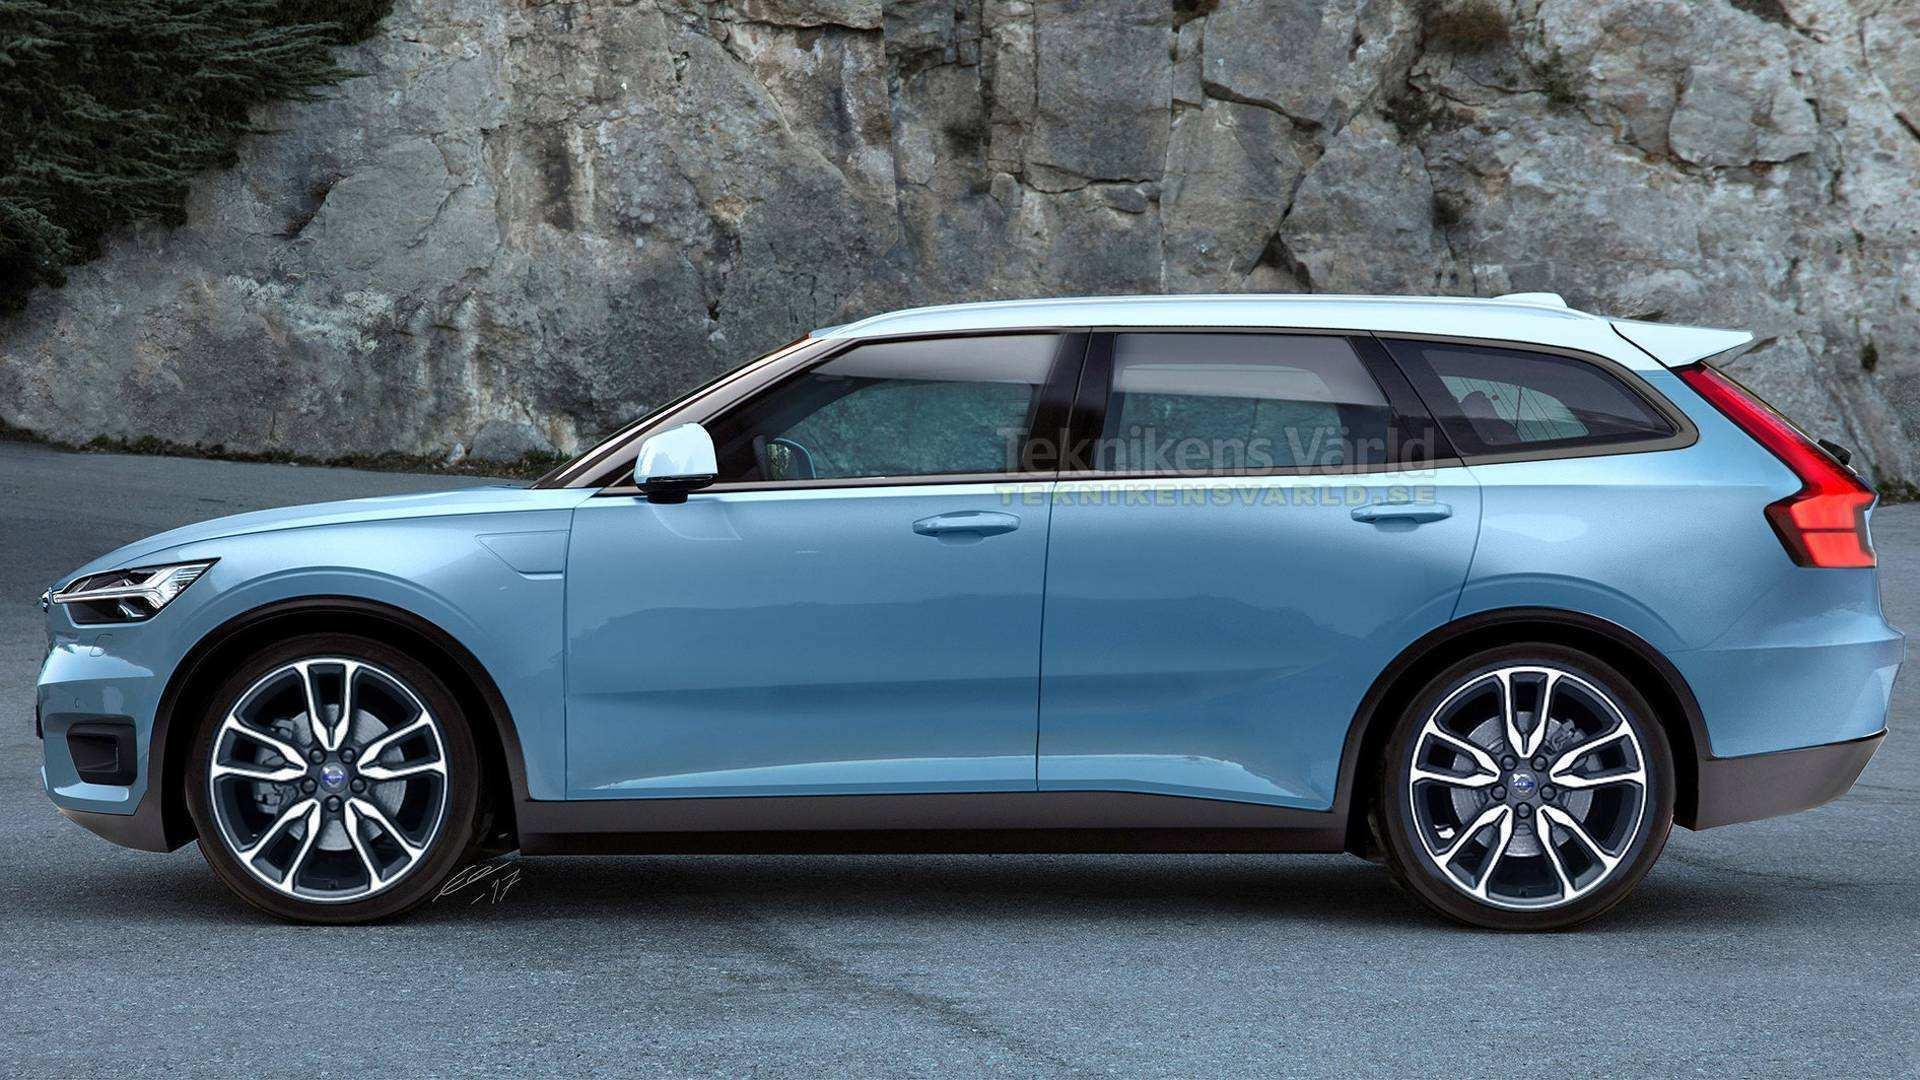 28 Best Review Volvo 2020 V40 Spy Shoot for Volvo 2020 V40